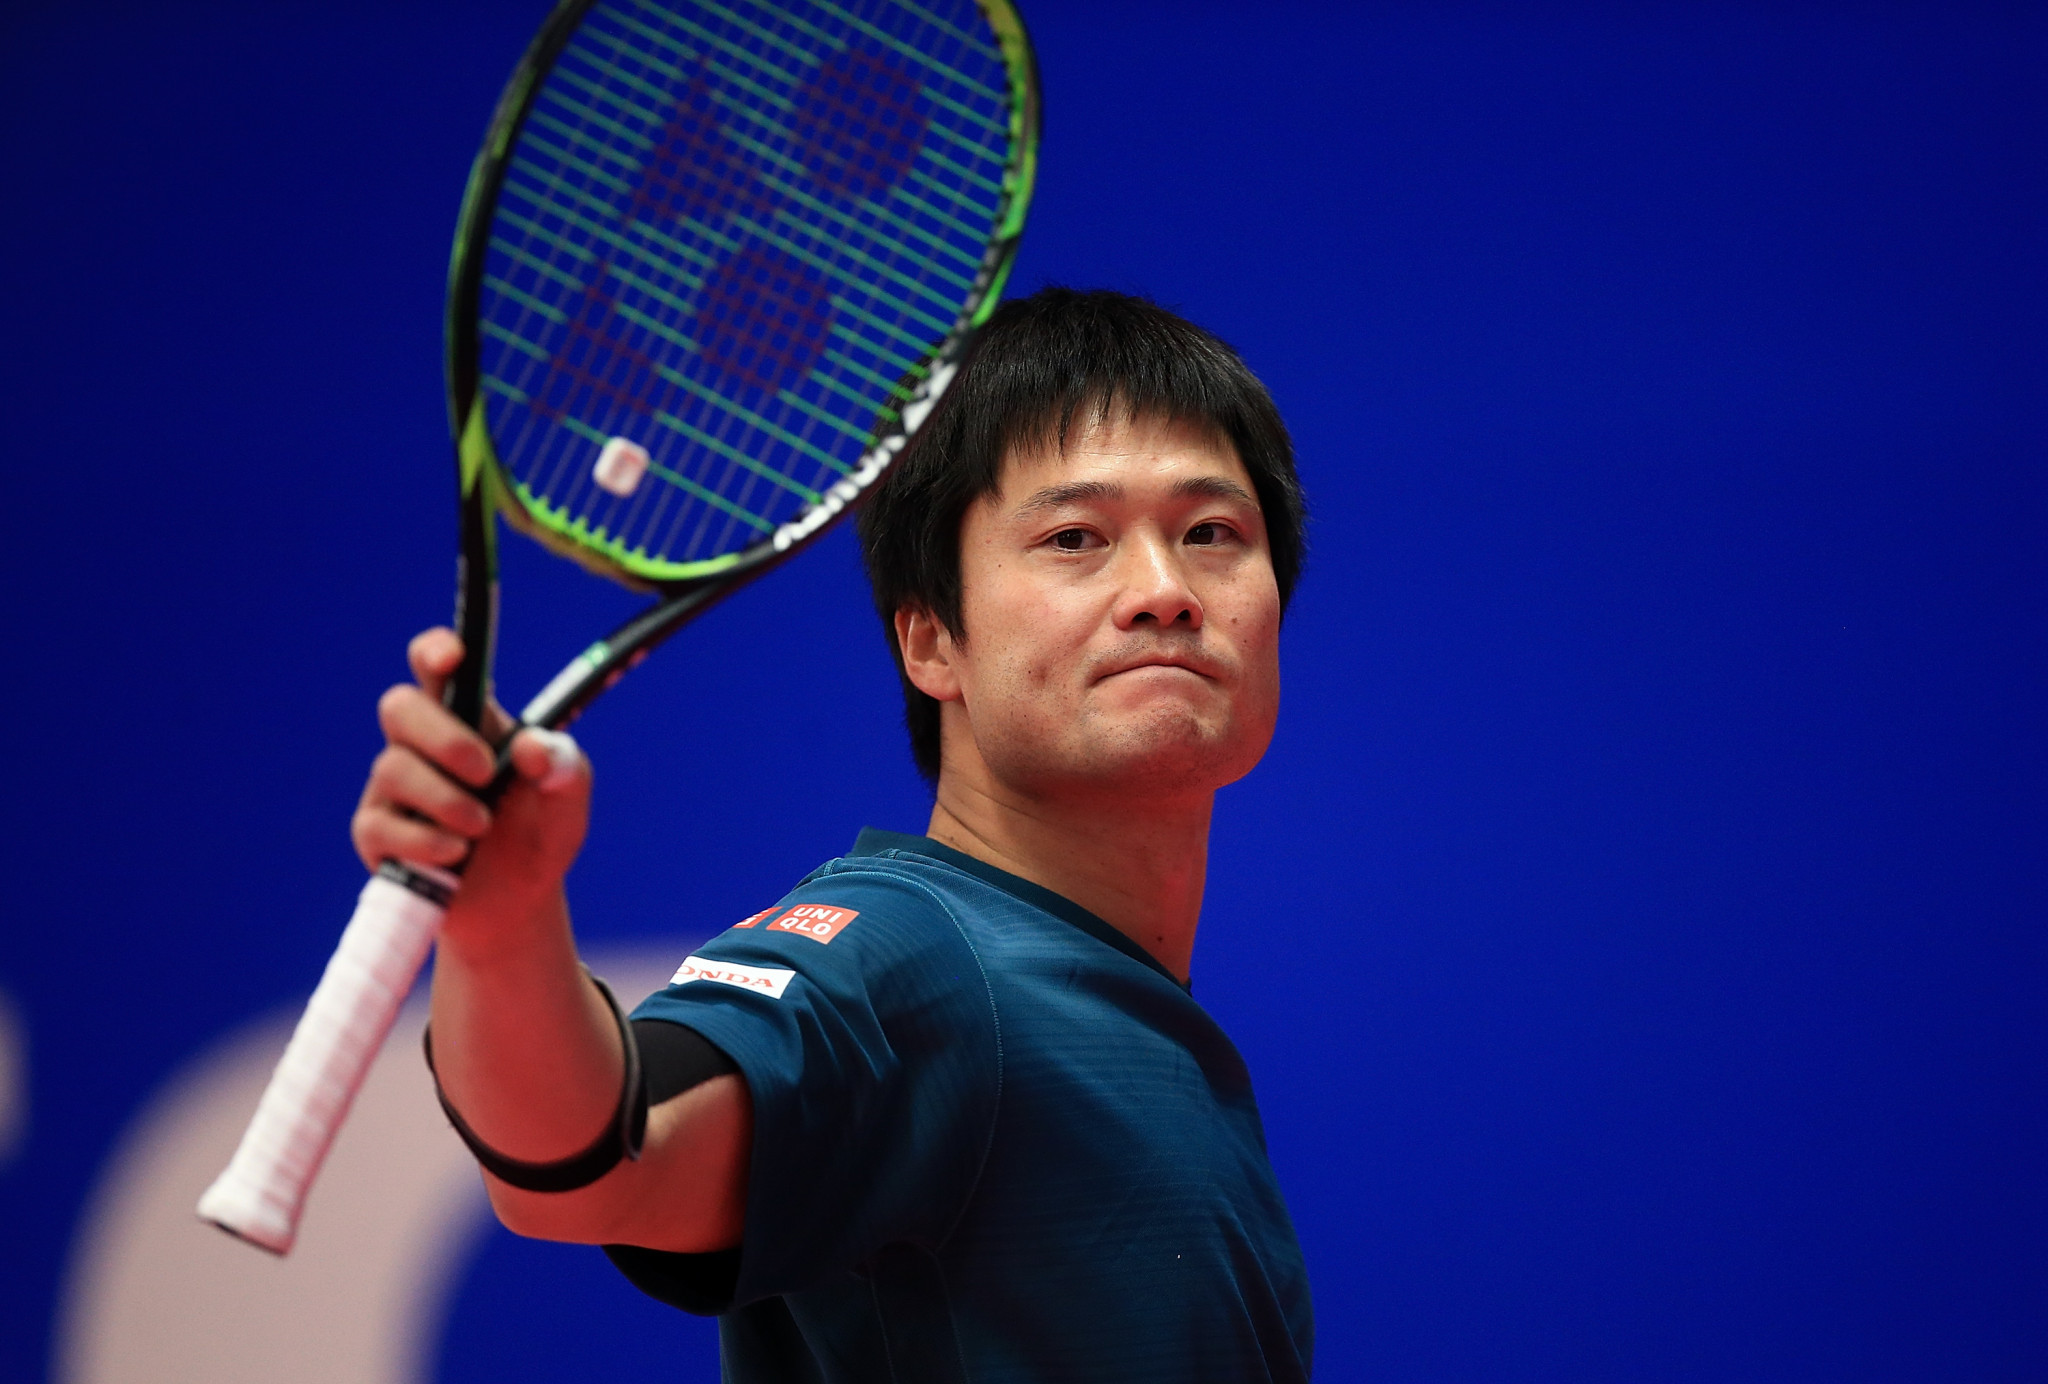 Kunieda beats top seed to reach semi-finals at Sydney International Wheelchair Tennis Open